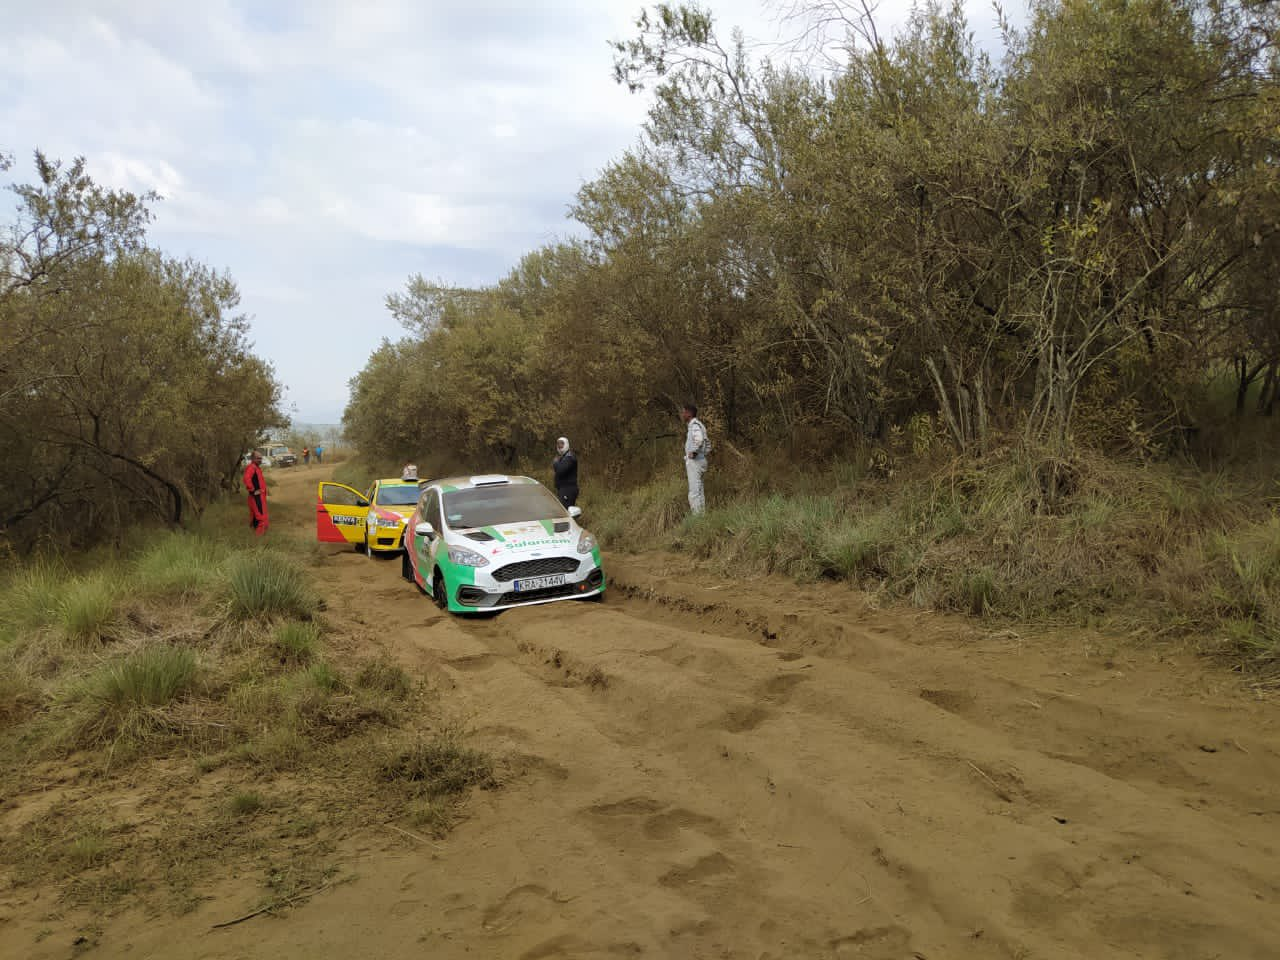 WRC: Safari Rally Kenya [23-27 Junio] - Página 3 E4umTEzXIAEZUdR?format=jpg&name=large